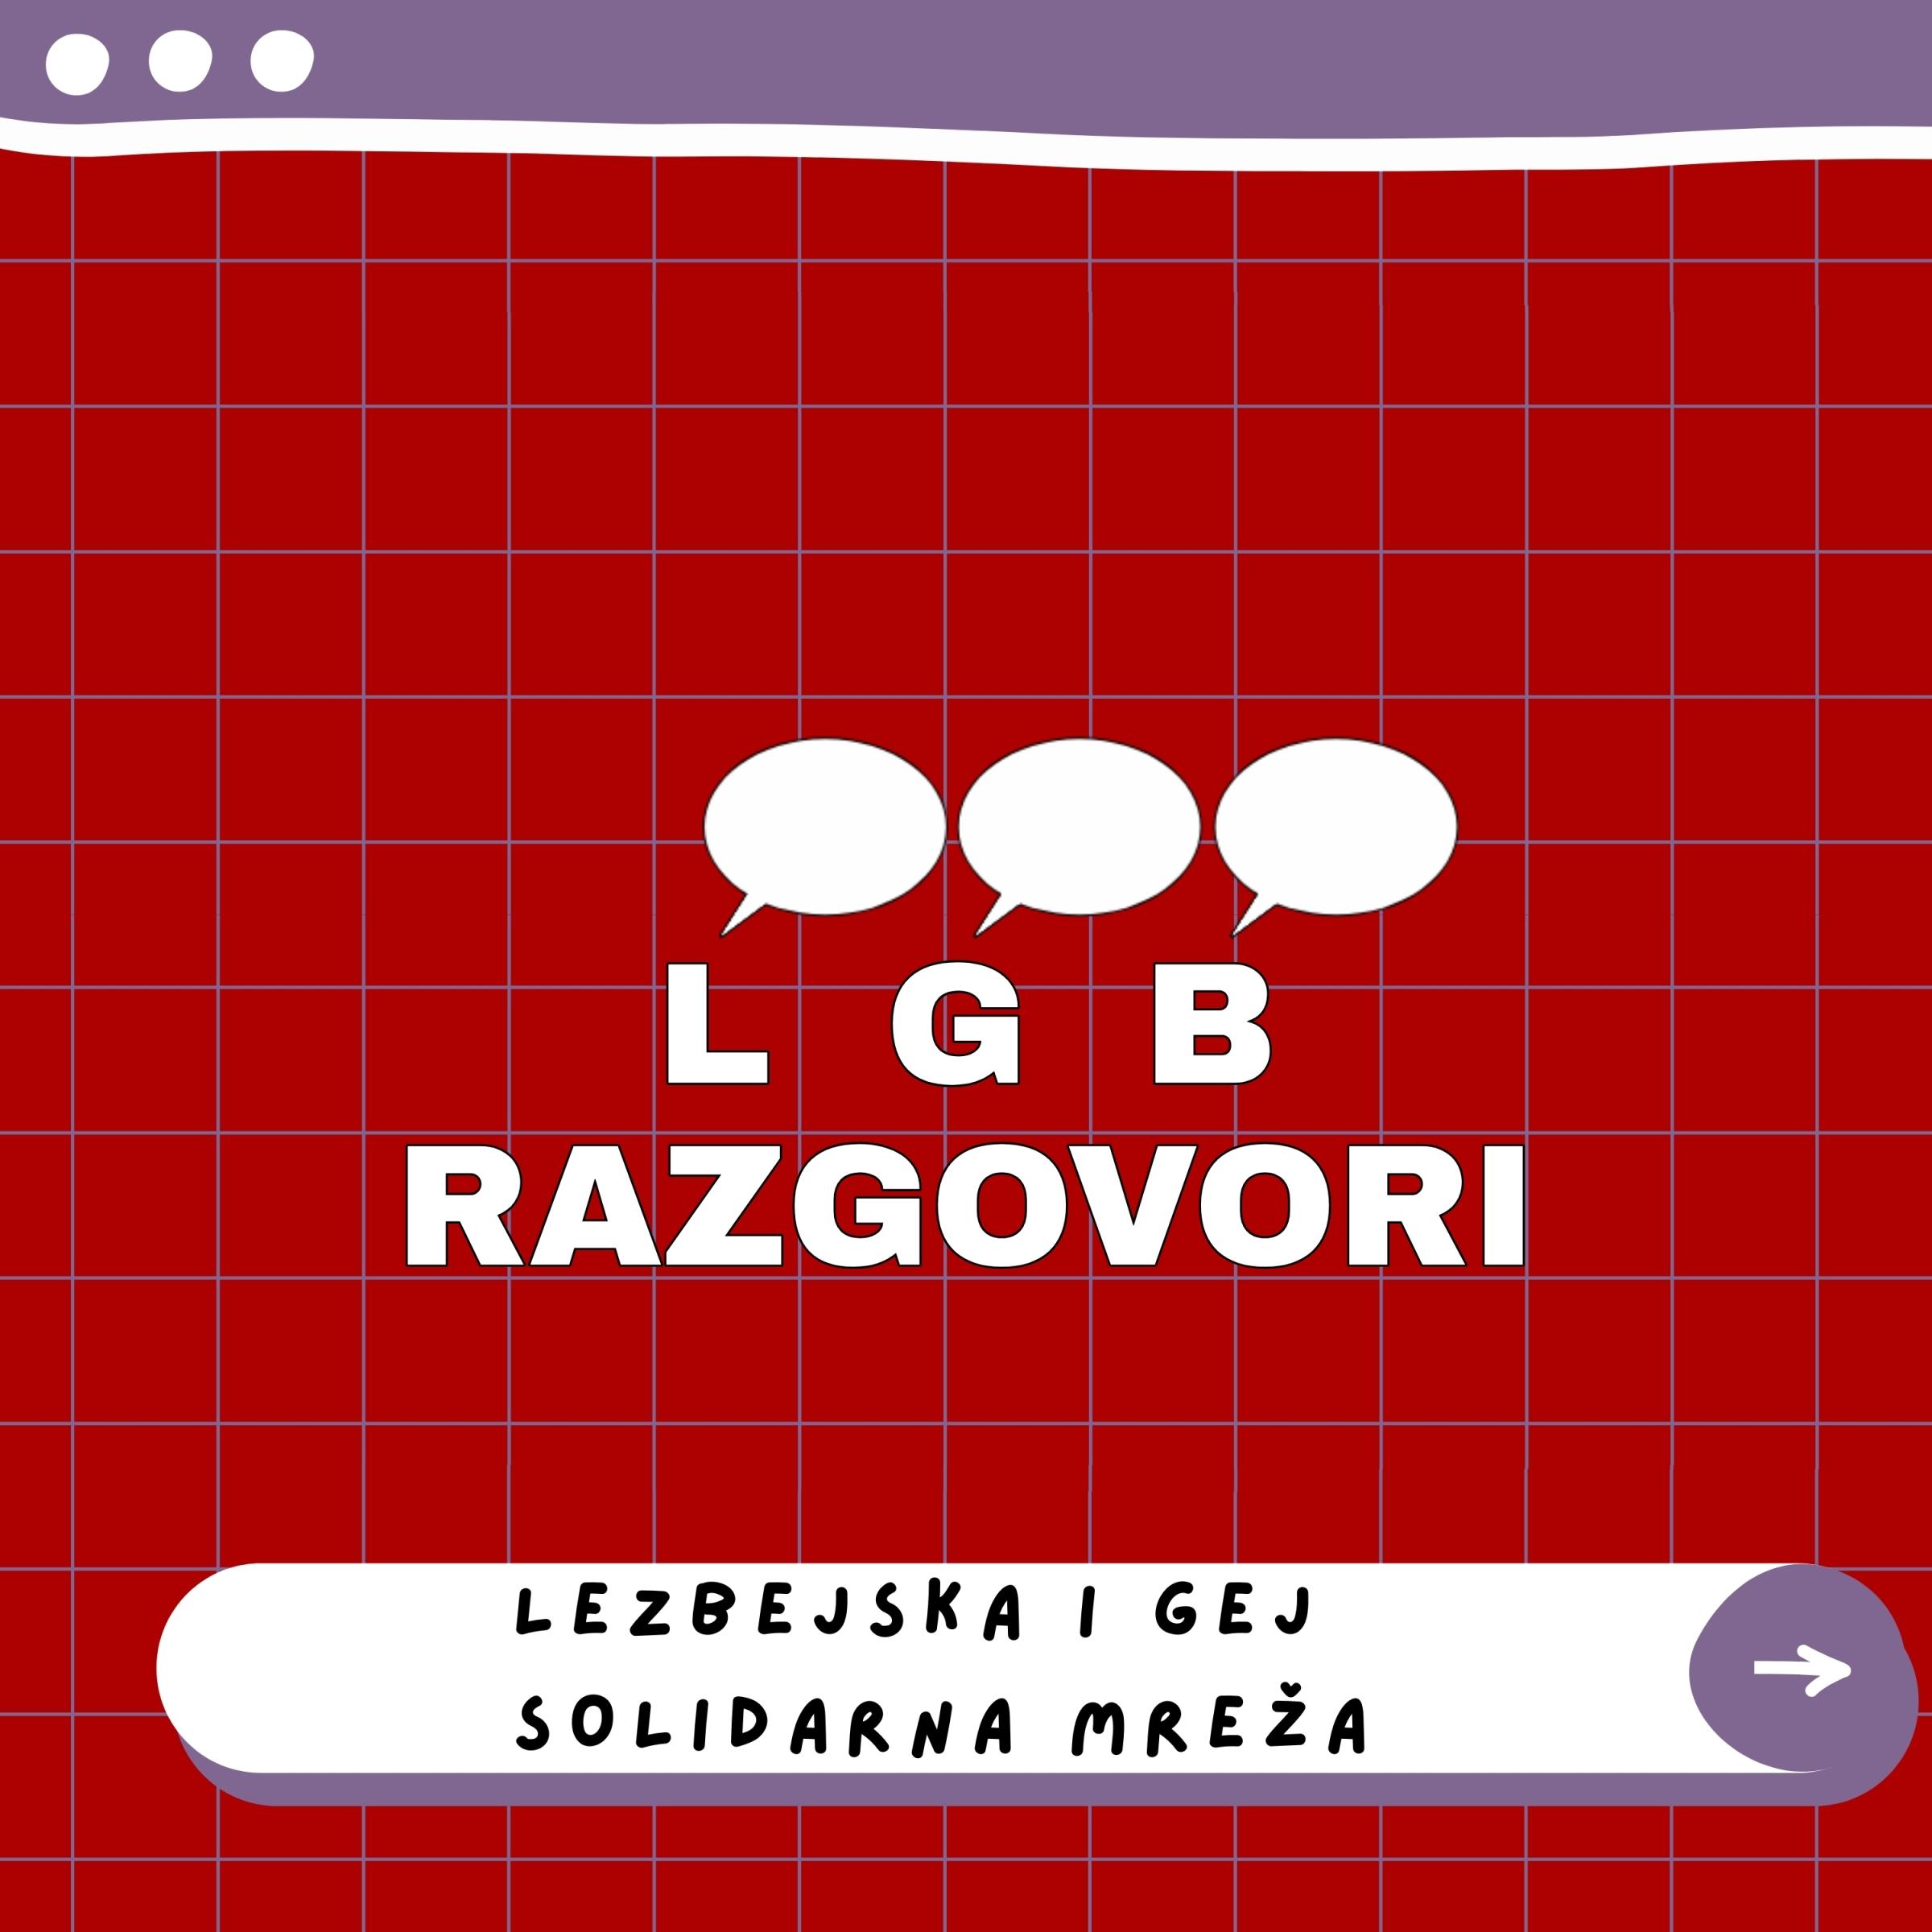 LGB razgovori - Lezbejska i gej solidarna mreža